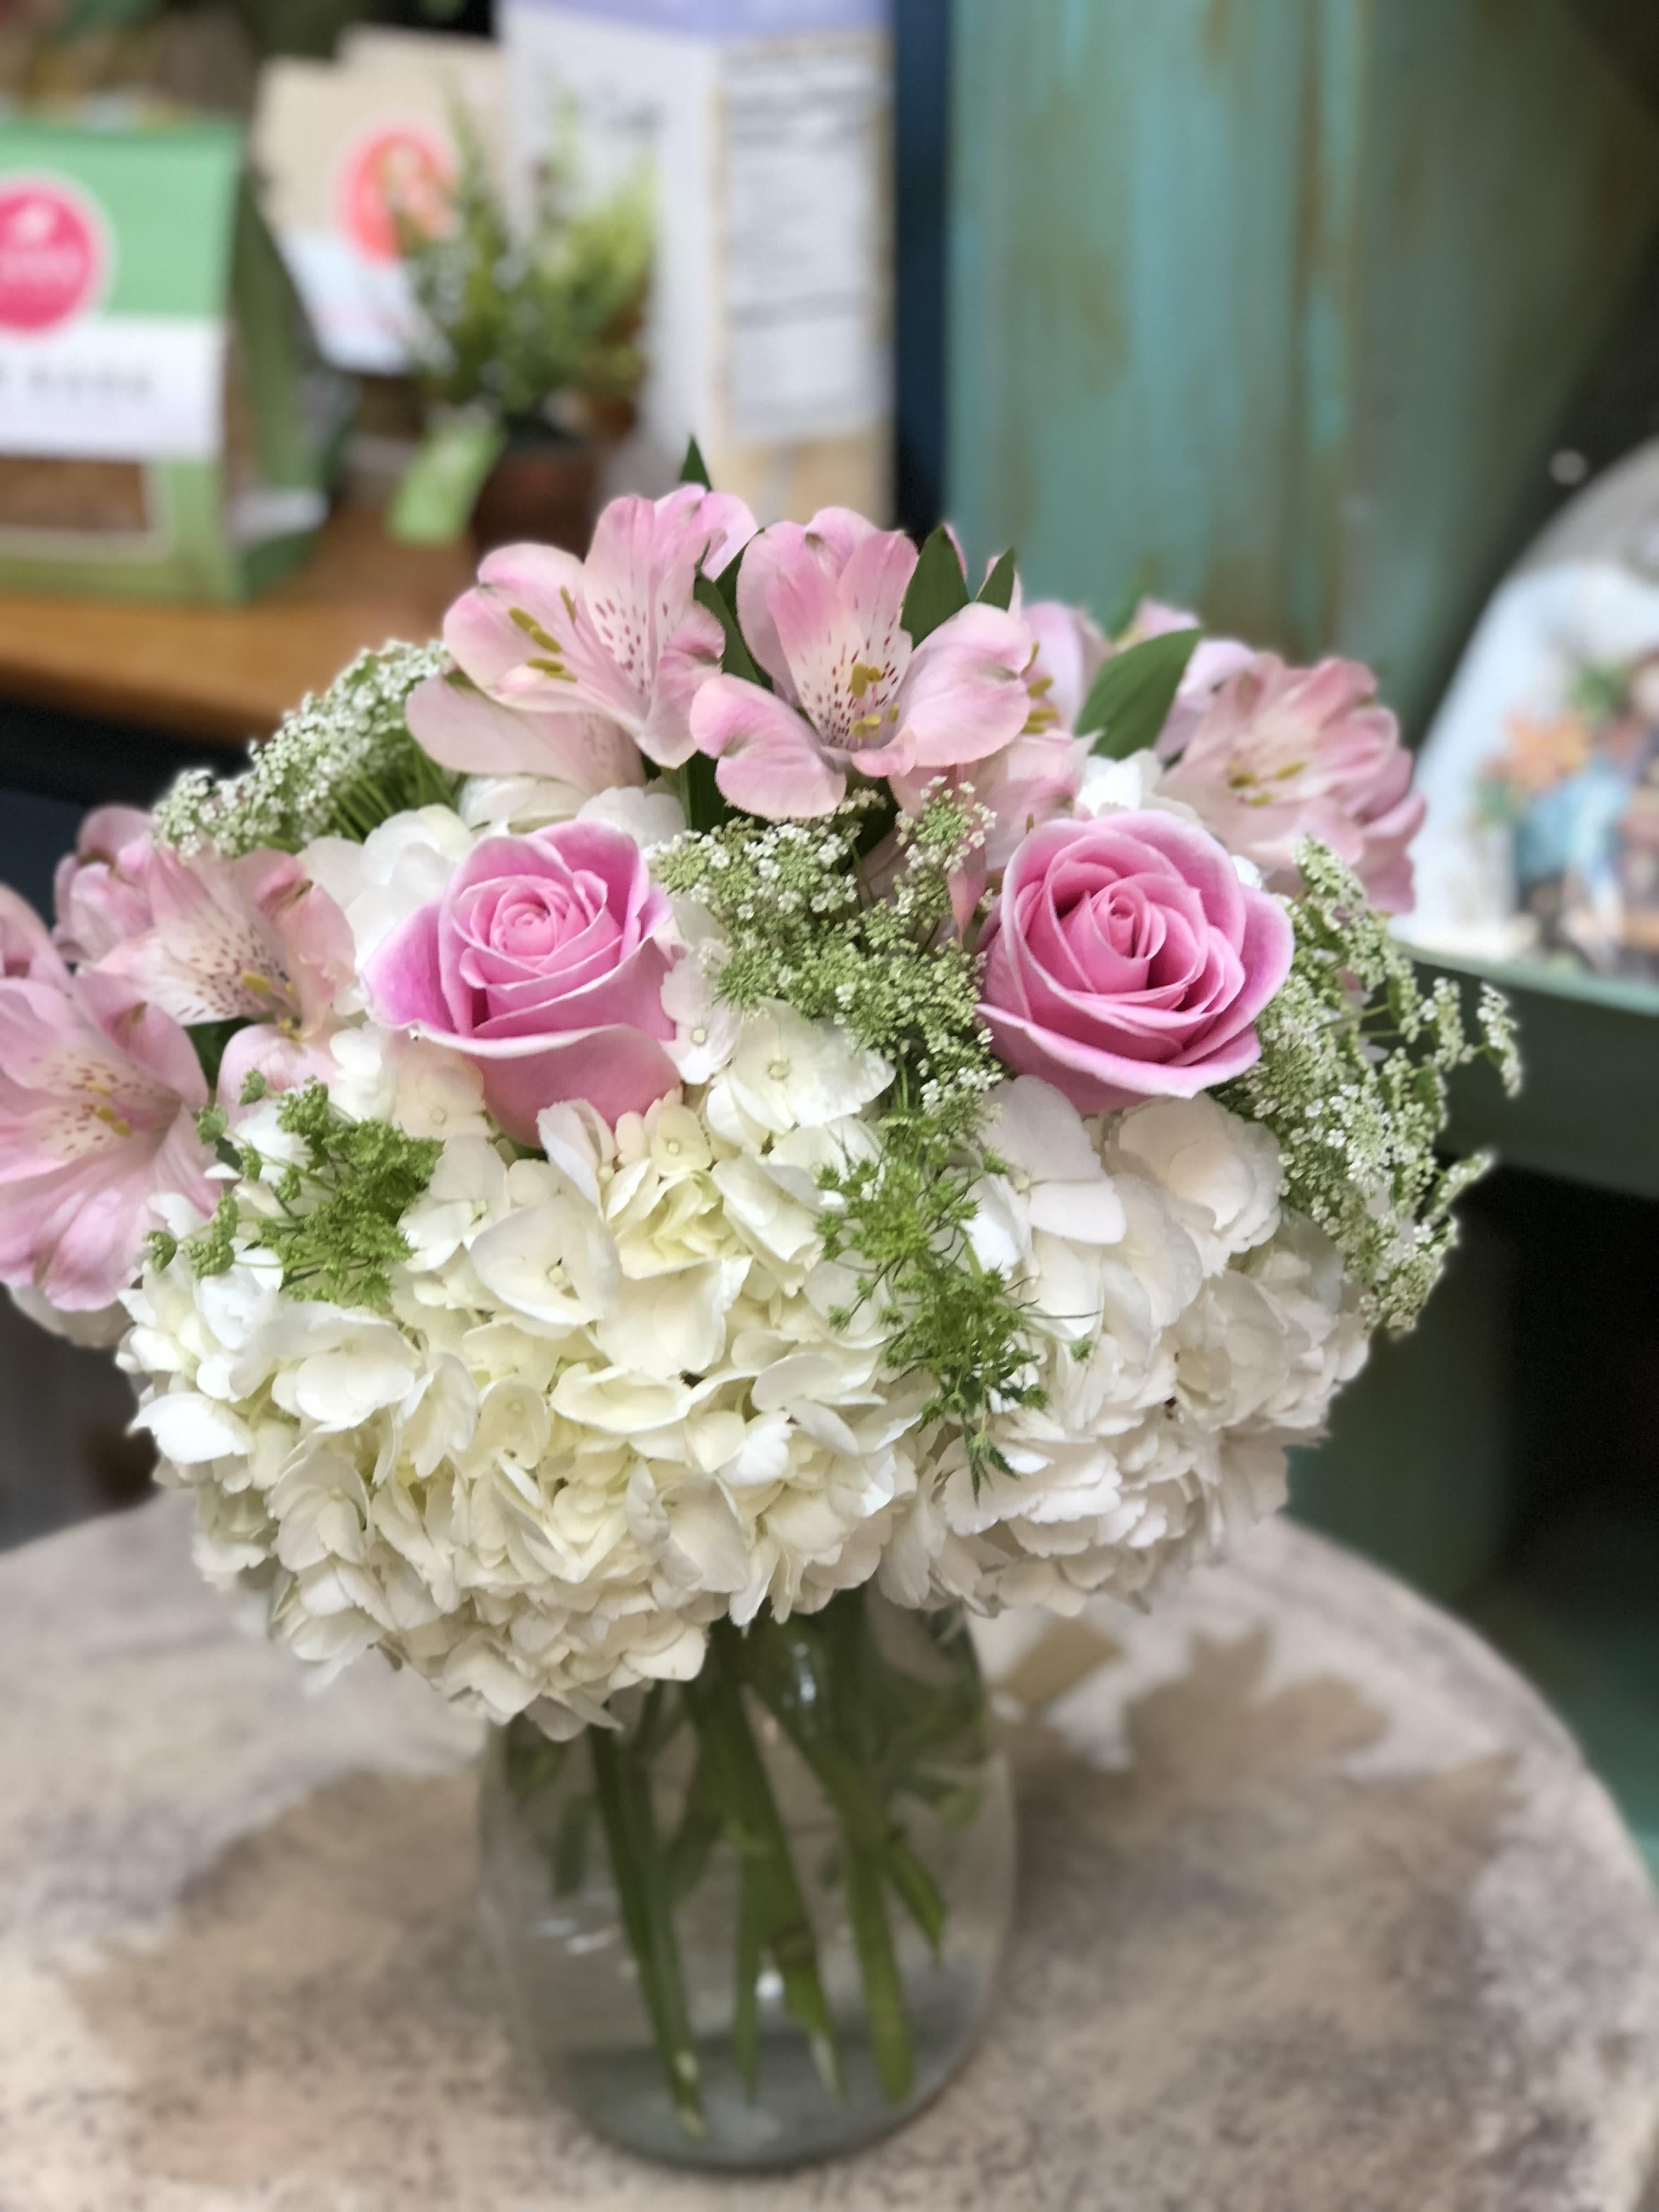 farmhouse musings: Hydrangeas |Country Hydrangeas Vase